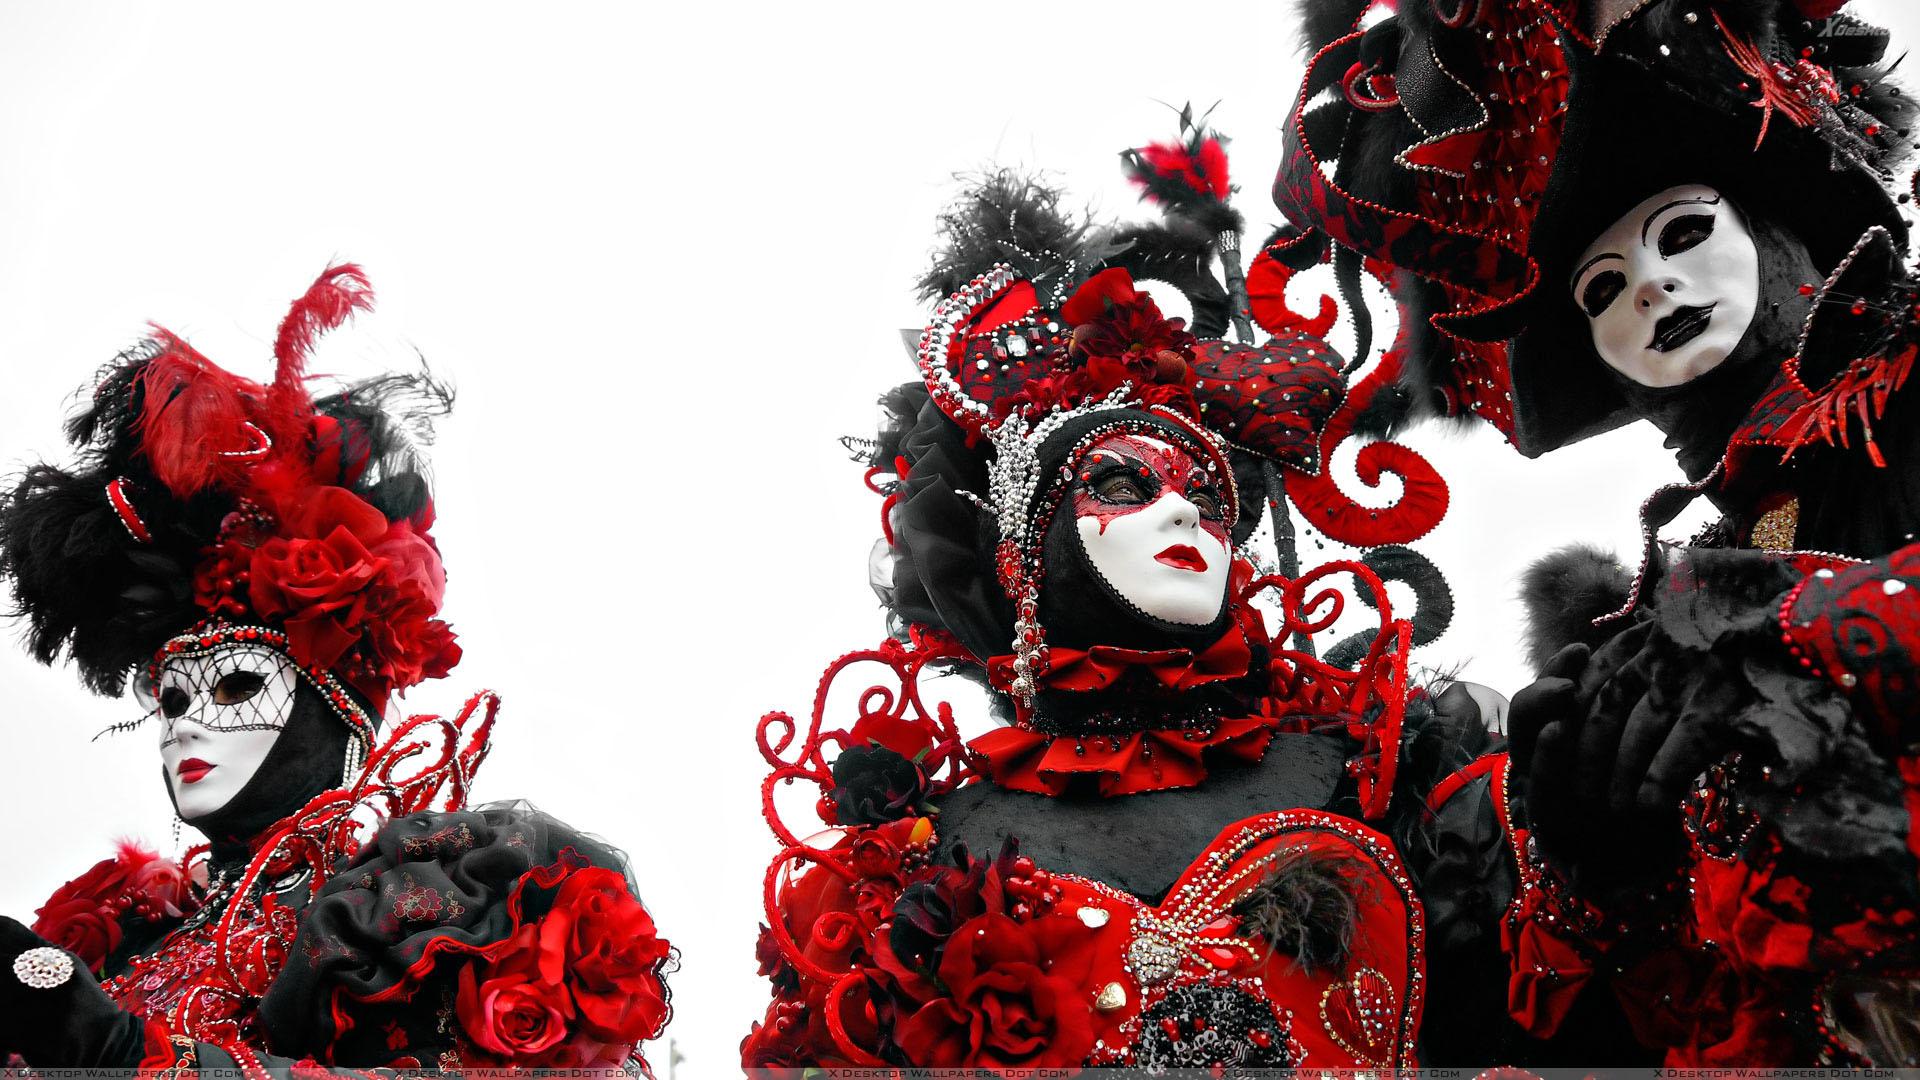 Black White and Red Wallpaper - WallpaperSafari